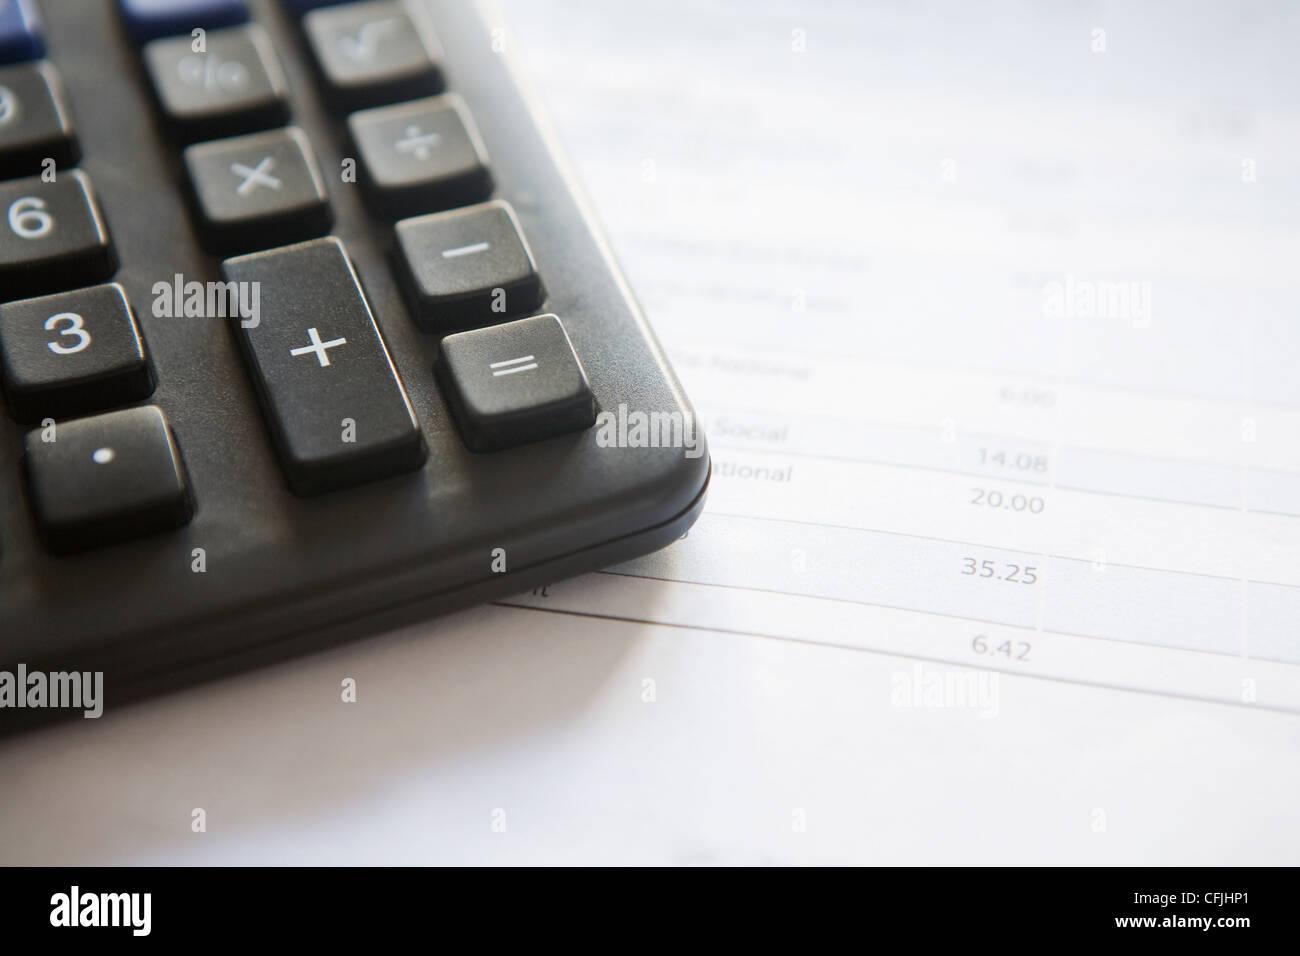 Calculator and bill - Stock Image